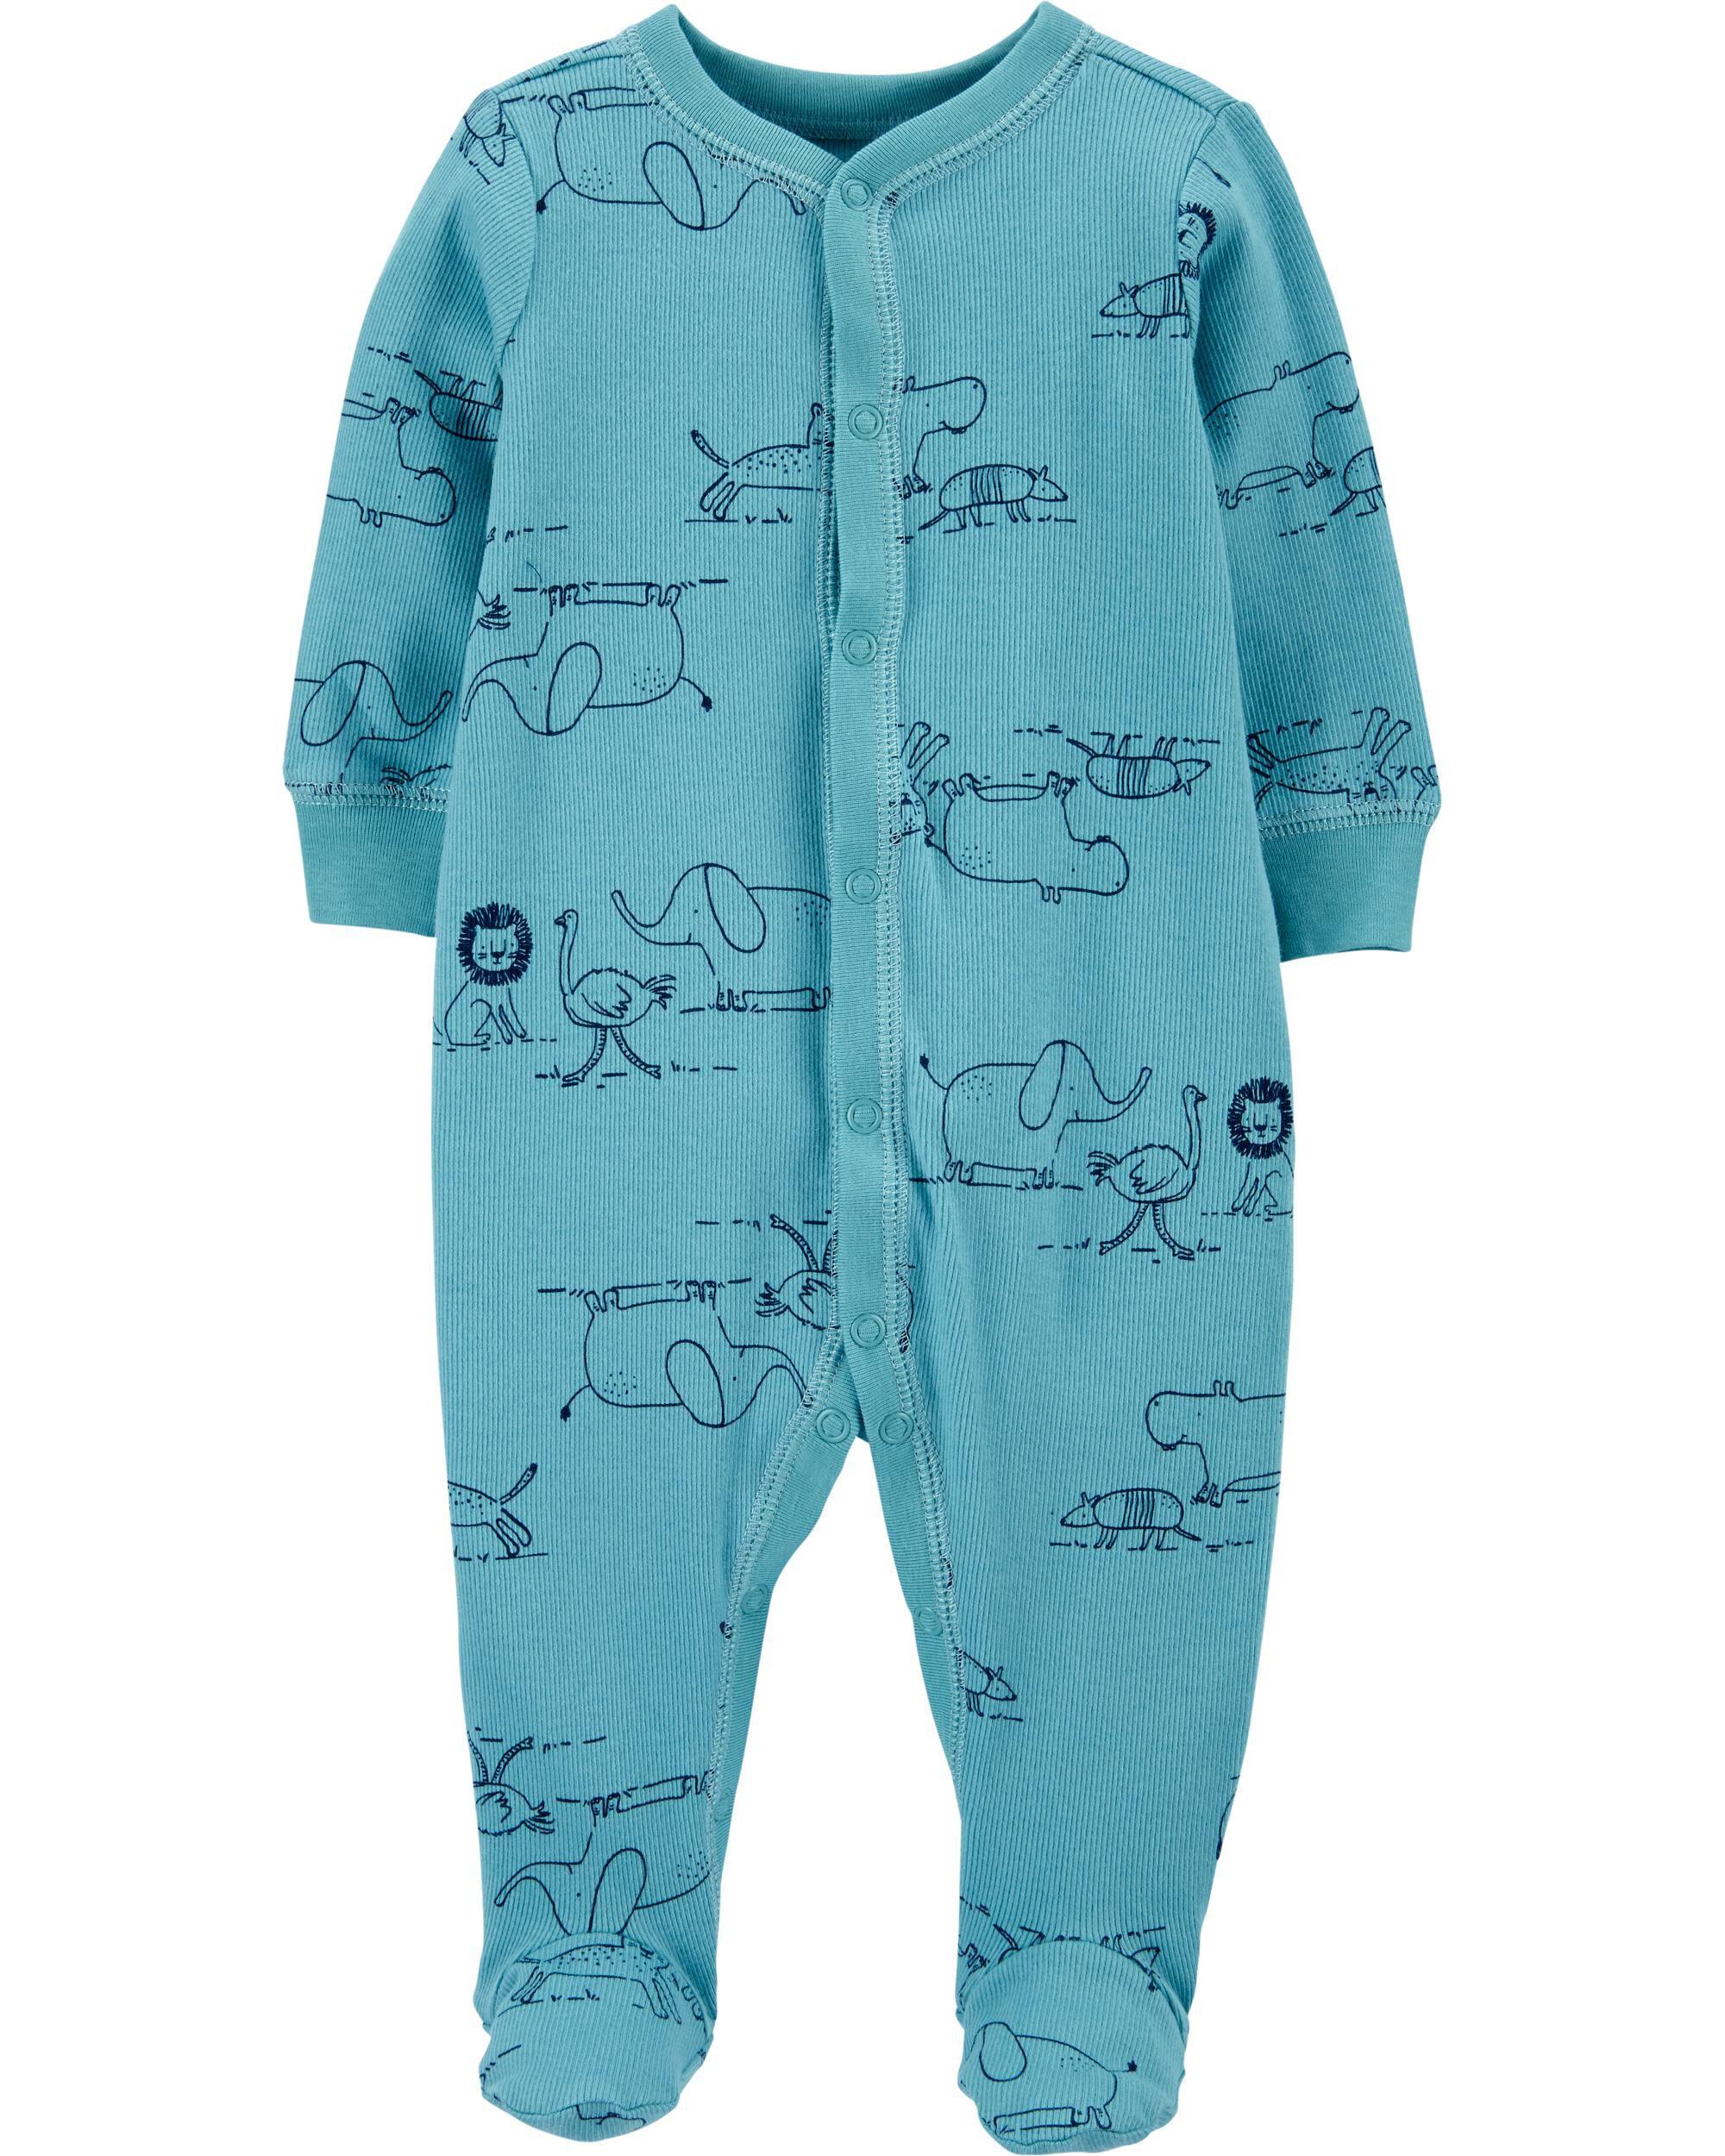 Zoo Animals Snap-Up Cotton Sleep & Play